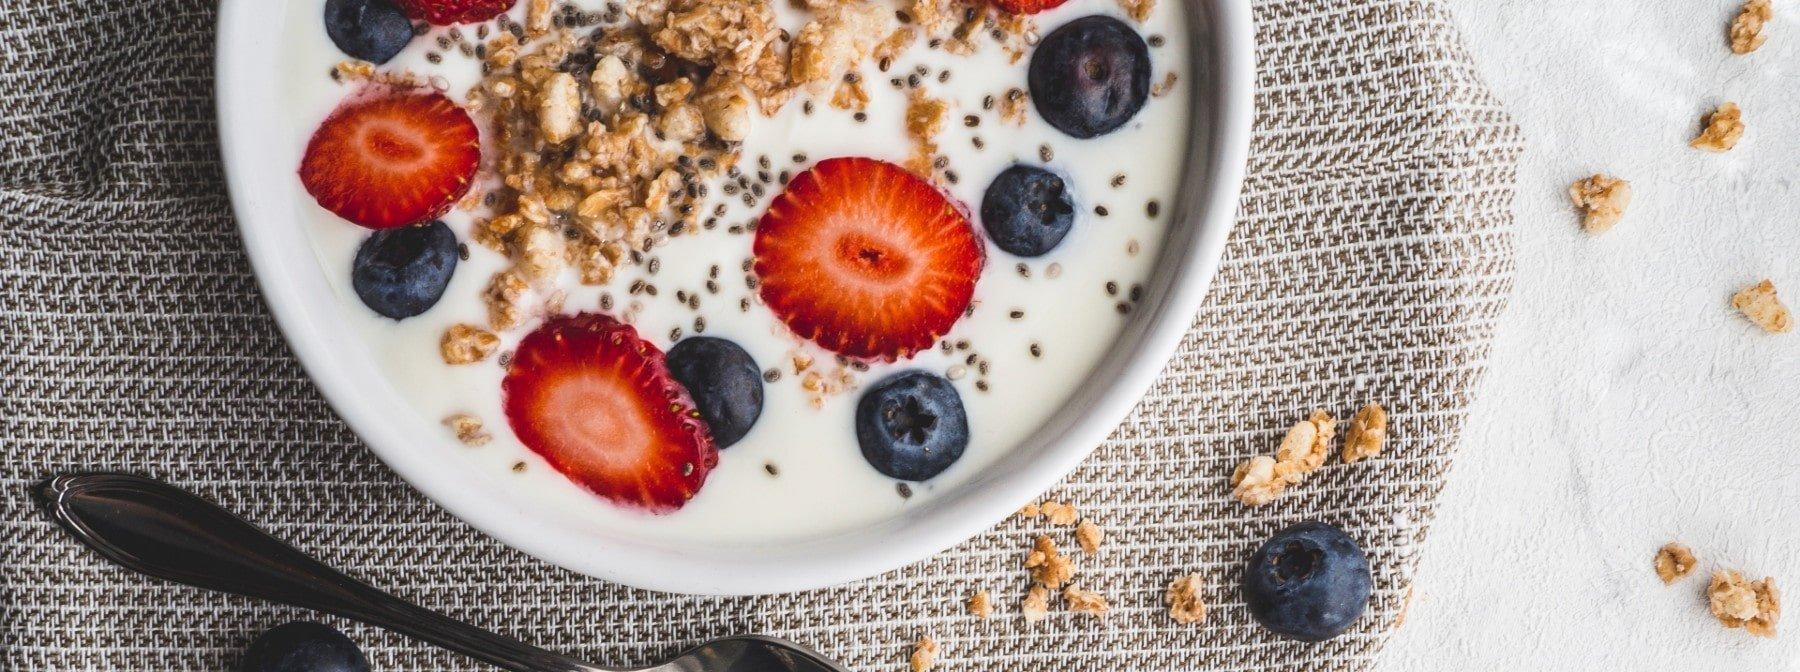 Top 7 de Alimentos Probióticos